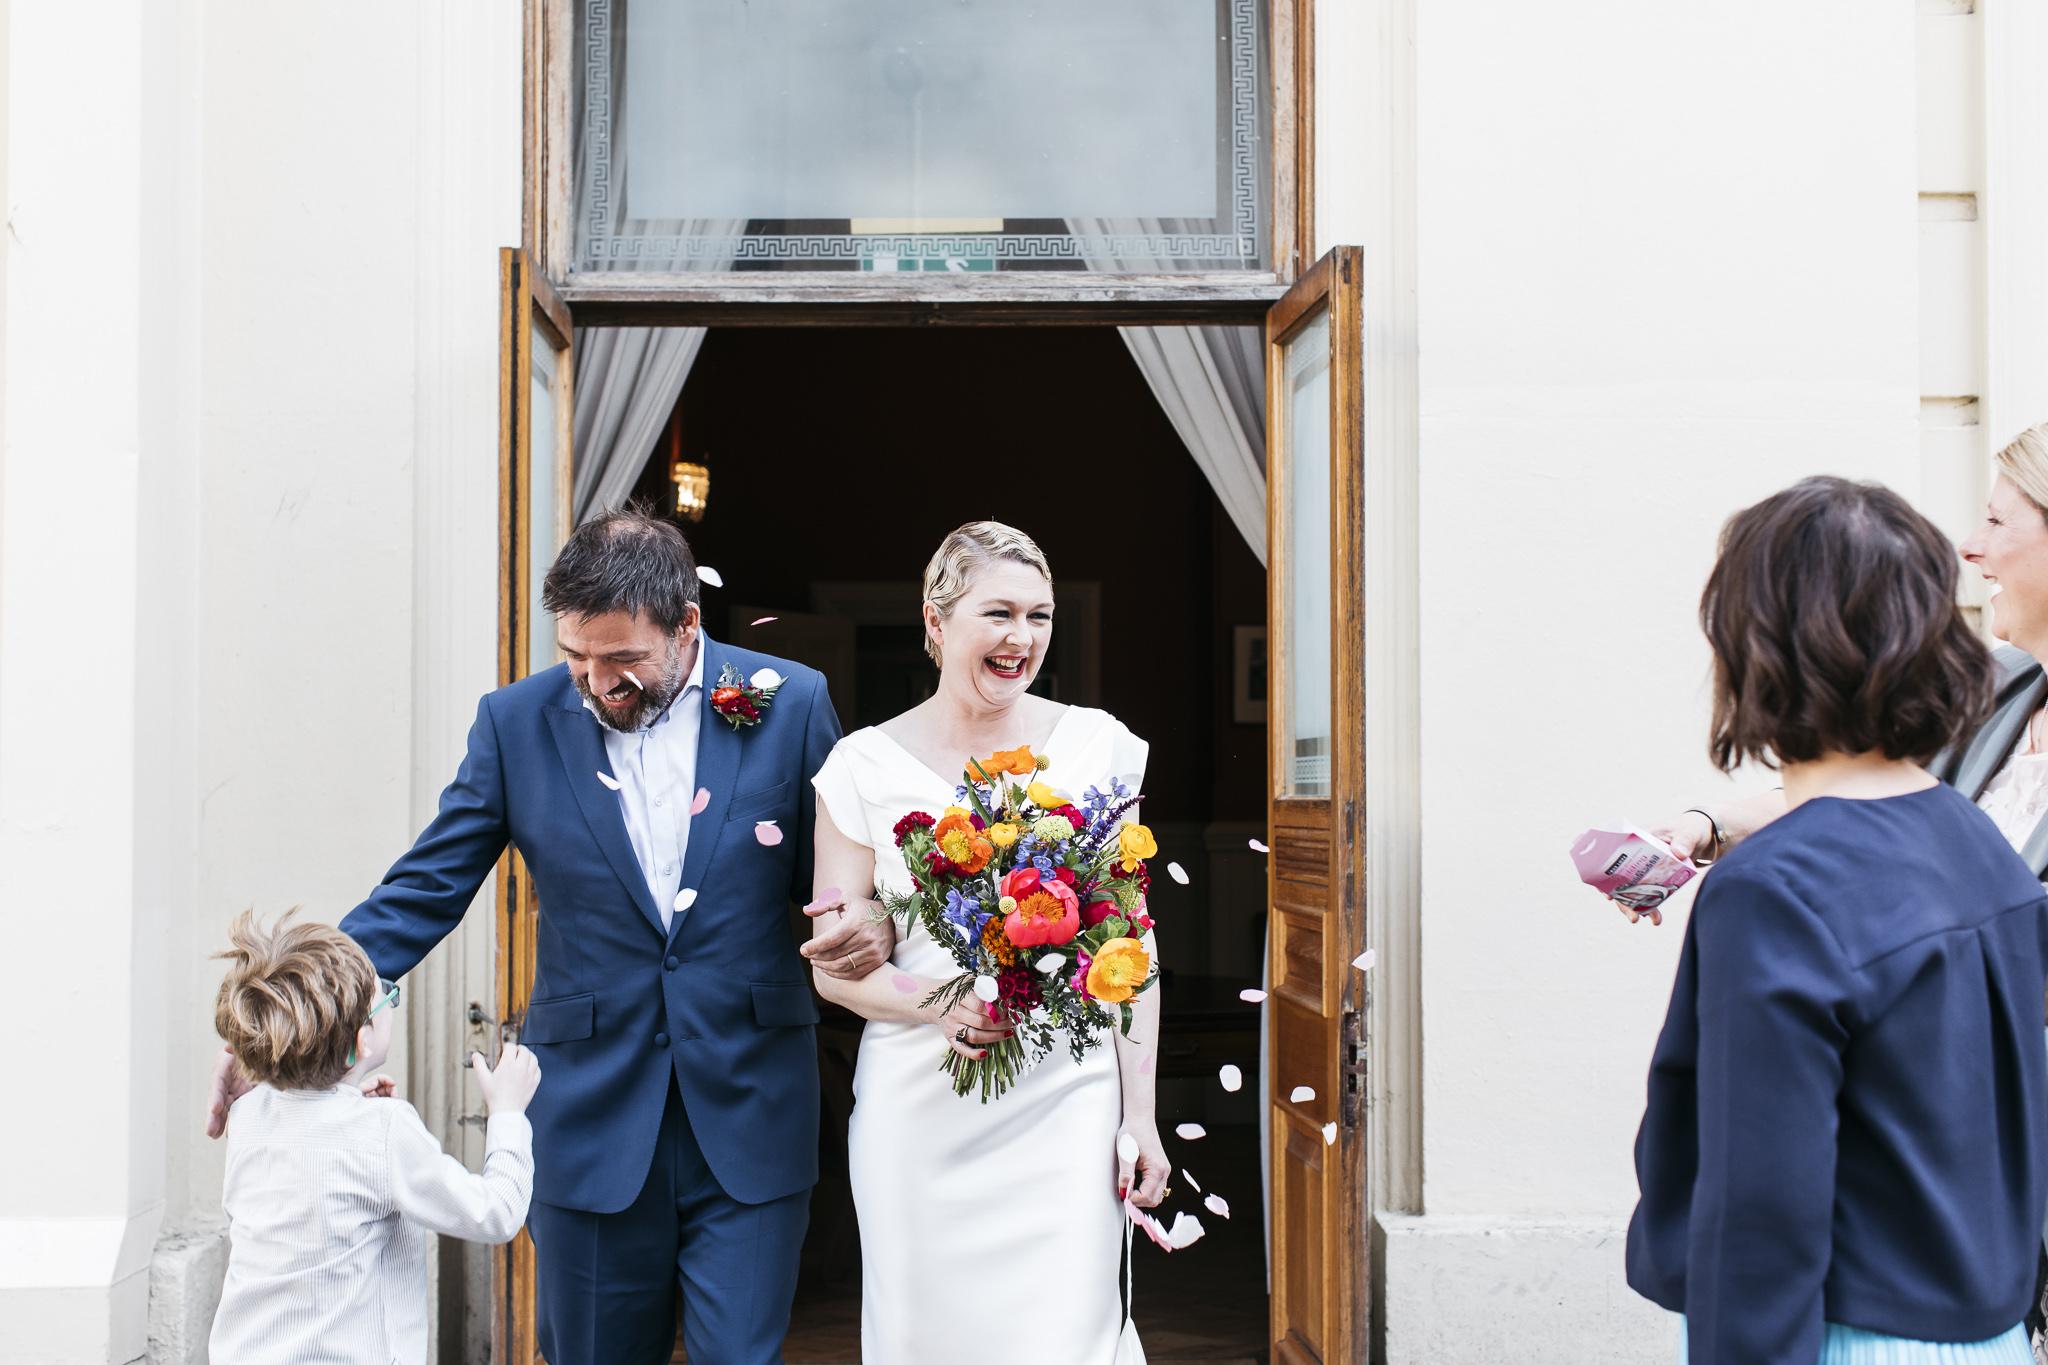 short_coverage_wedding_photographer_brighton_018.jpg